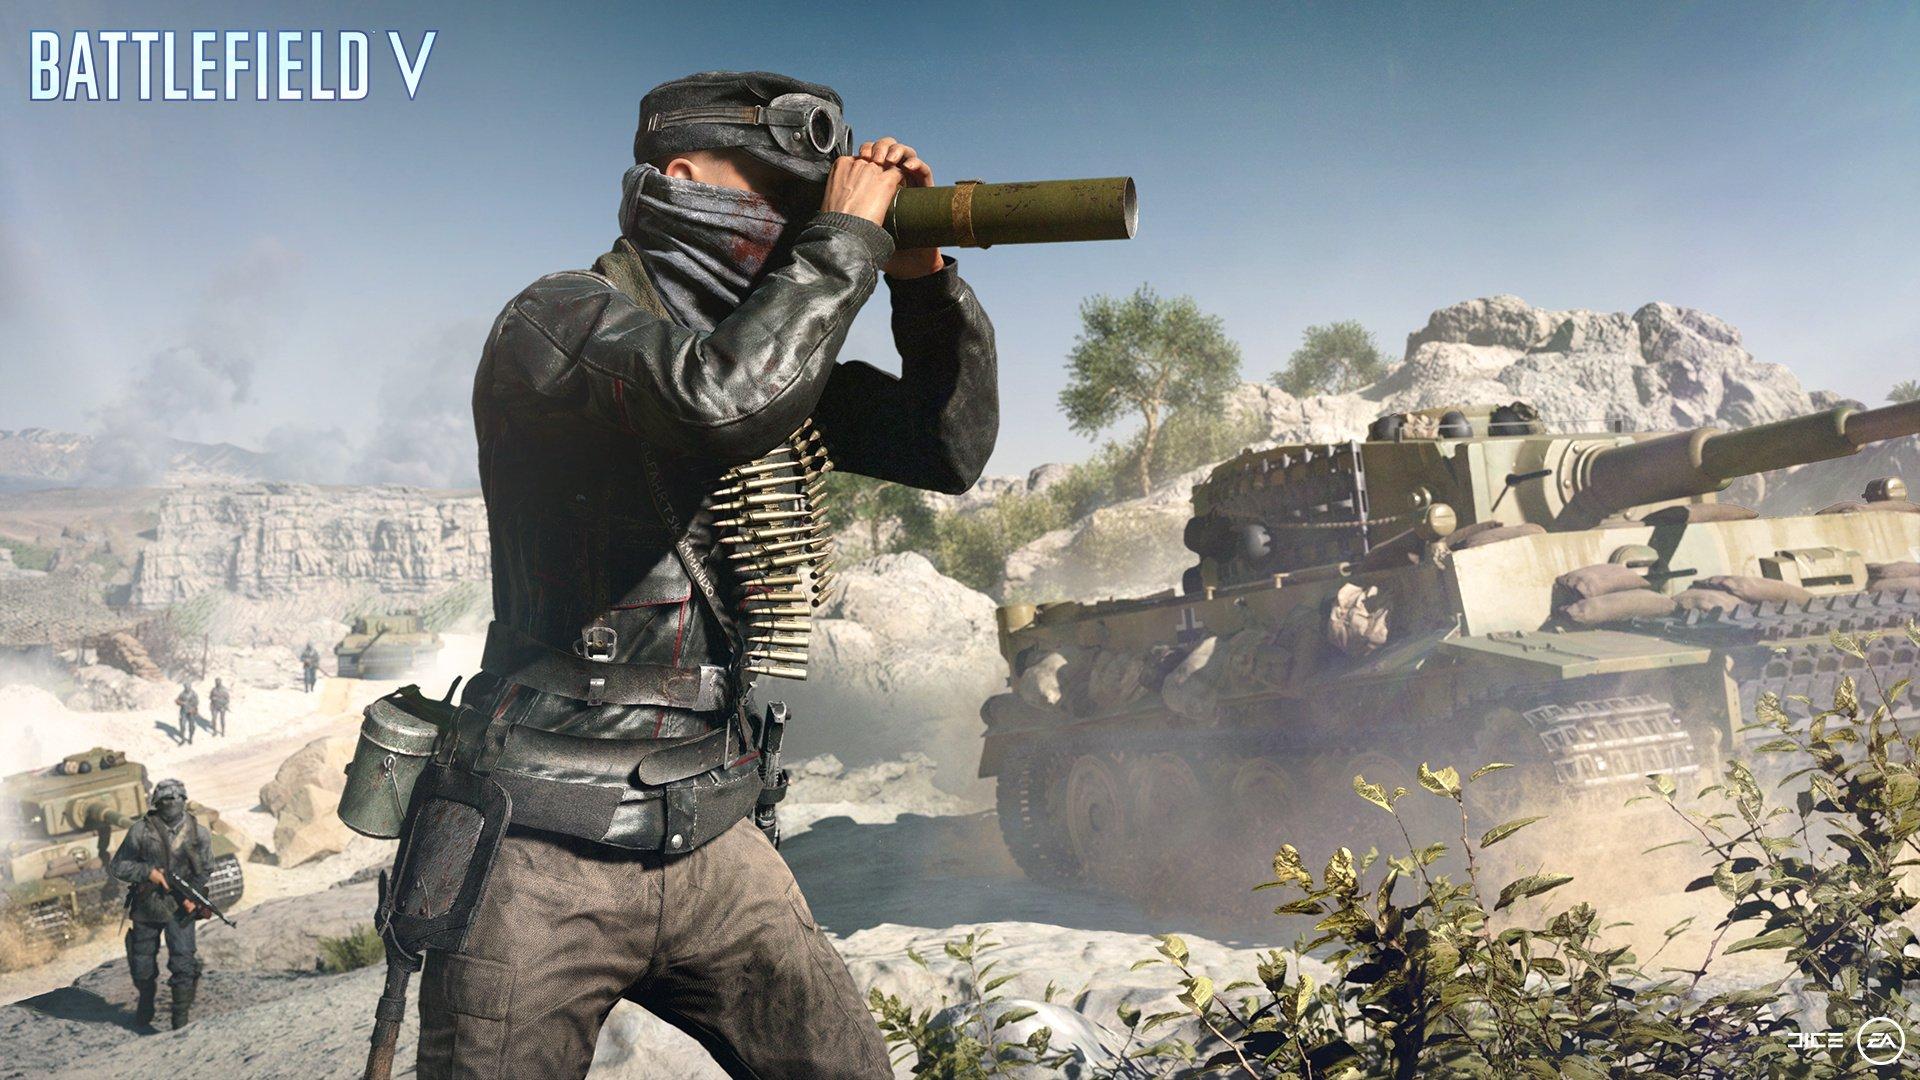 Battlefield 5 - All Recon Combat Roles, Weapons, Gadgets